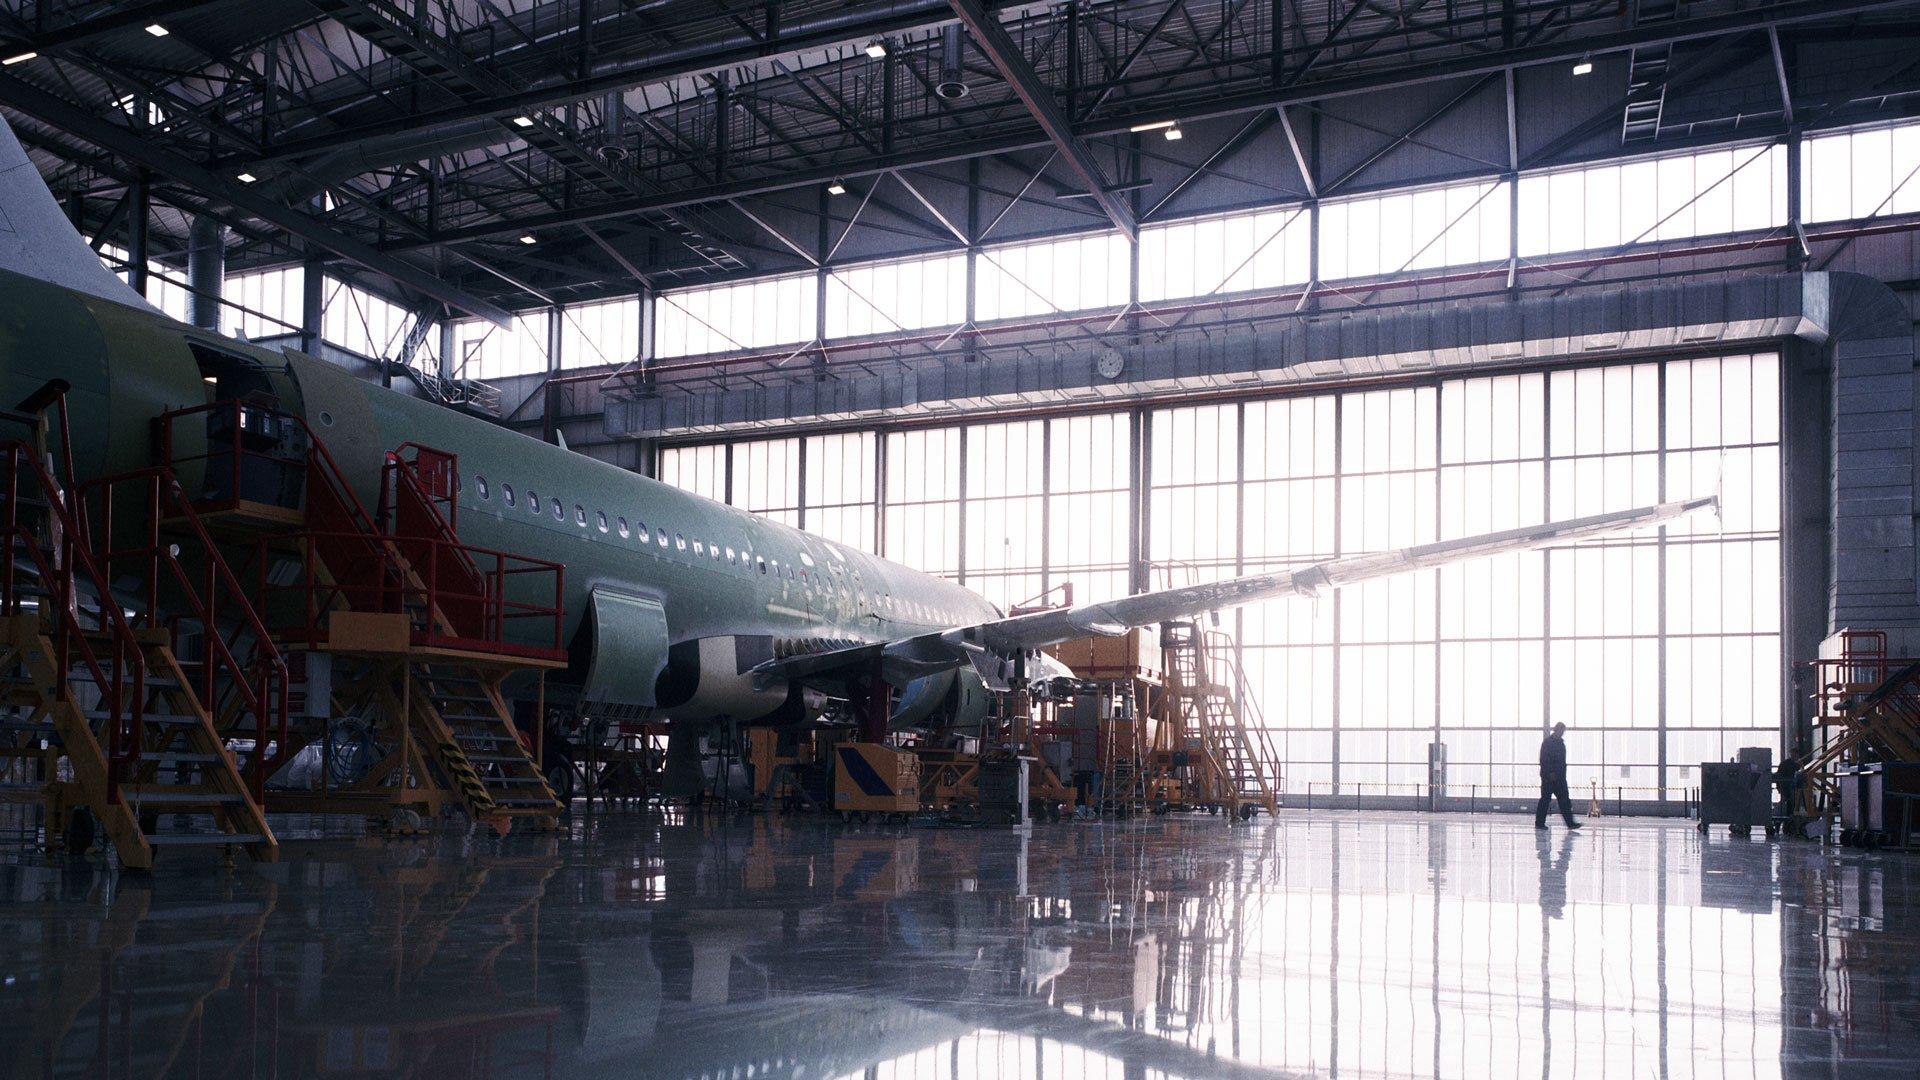 A1-aircraft-storage-01